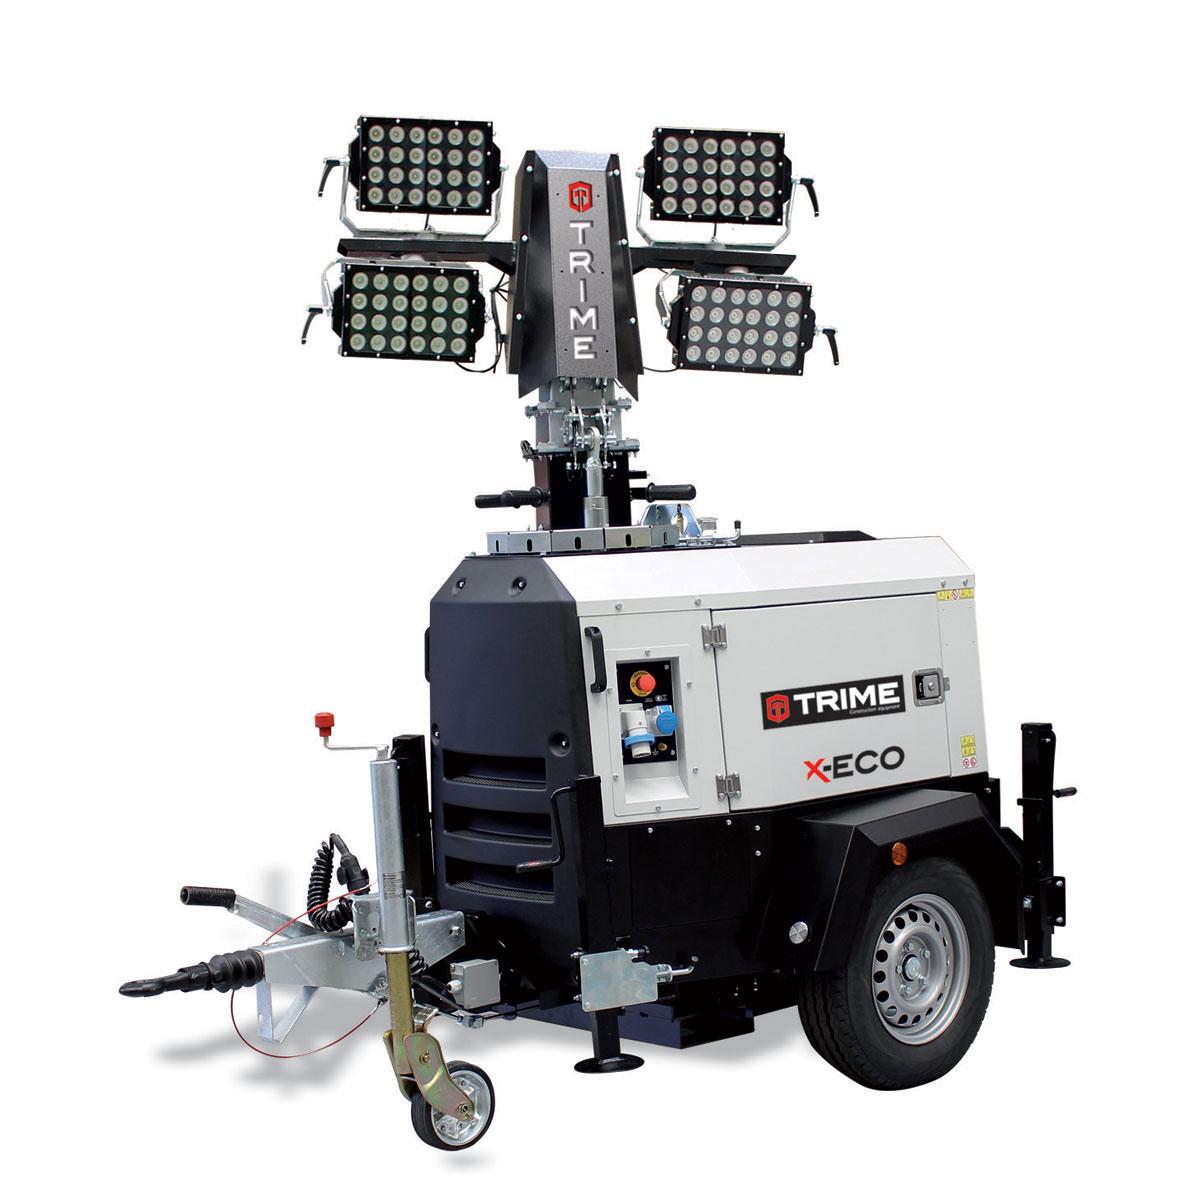 belysningsmast-led-x-eco-4x300W-48V-stangd